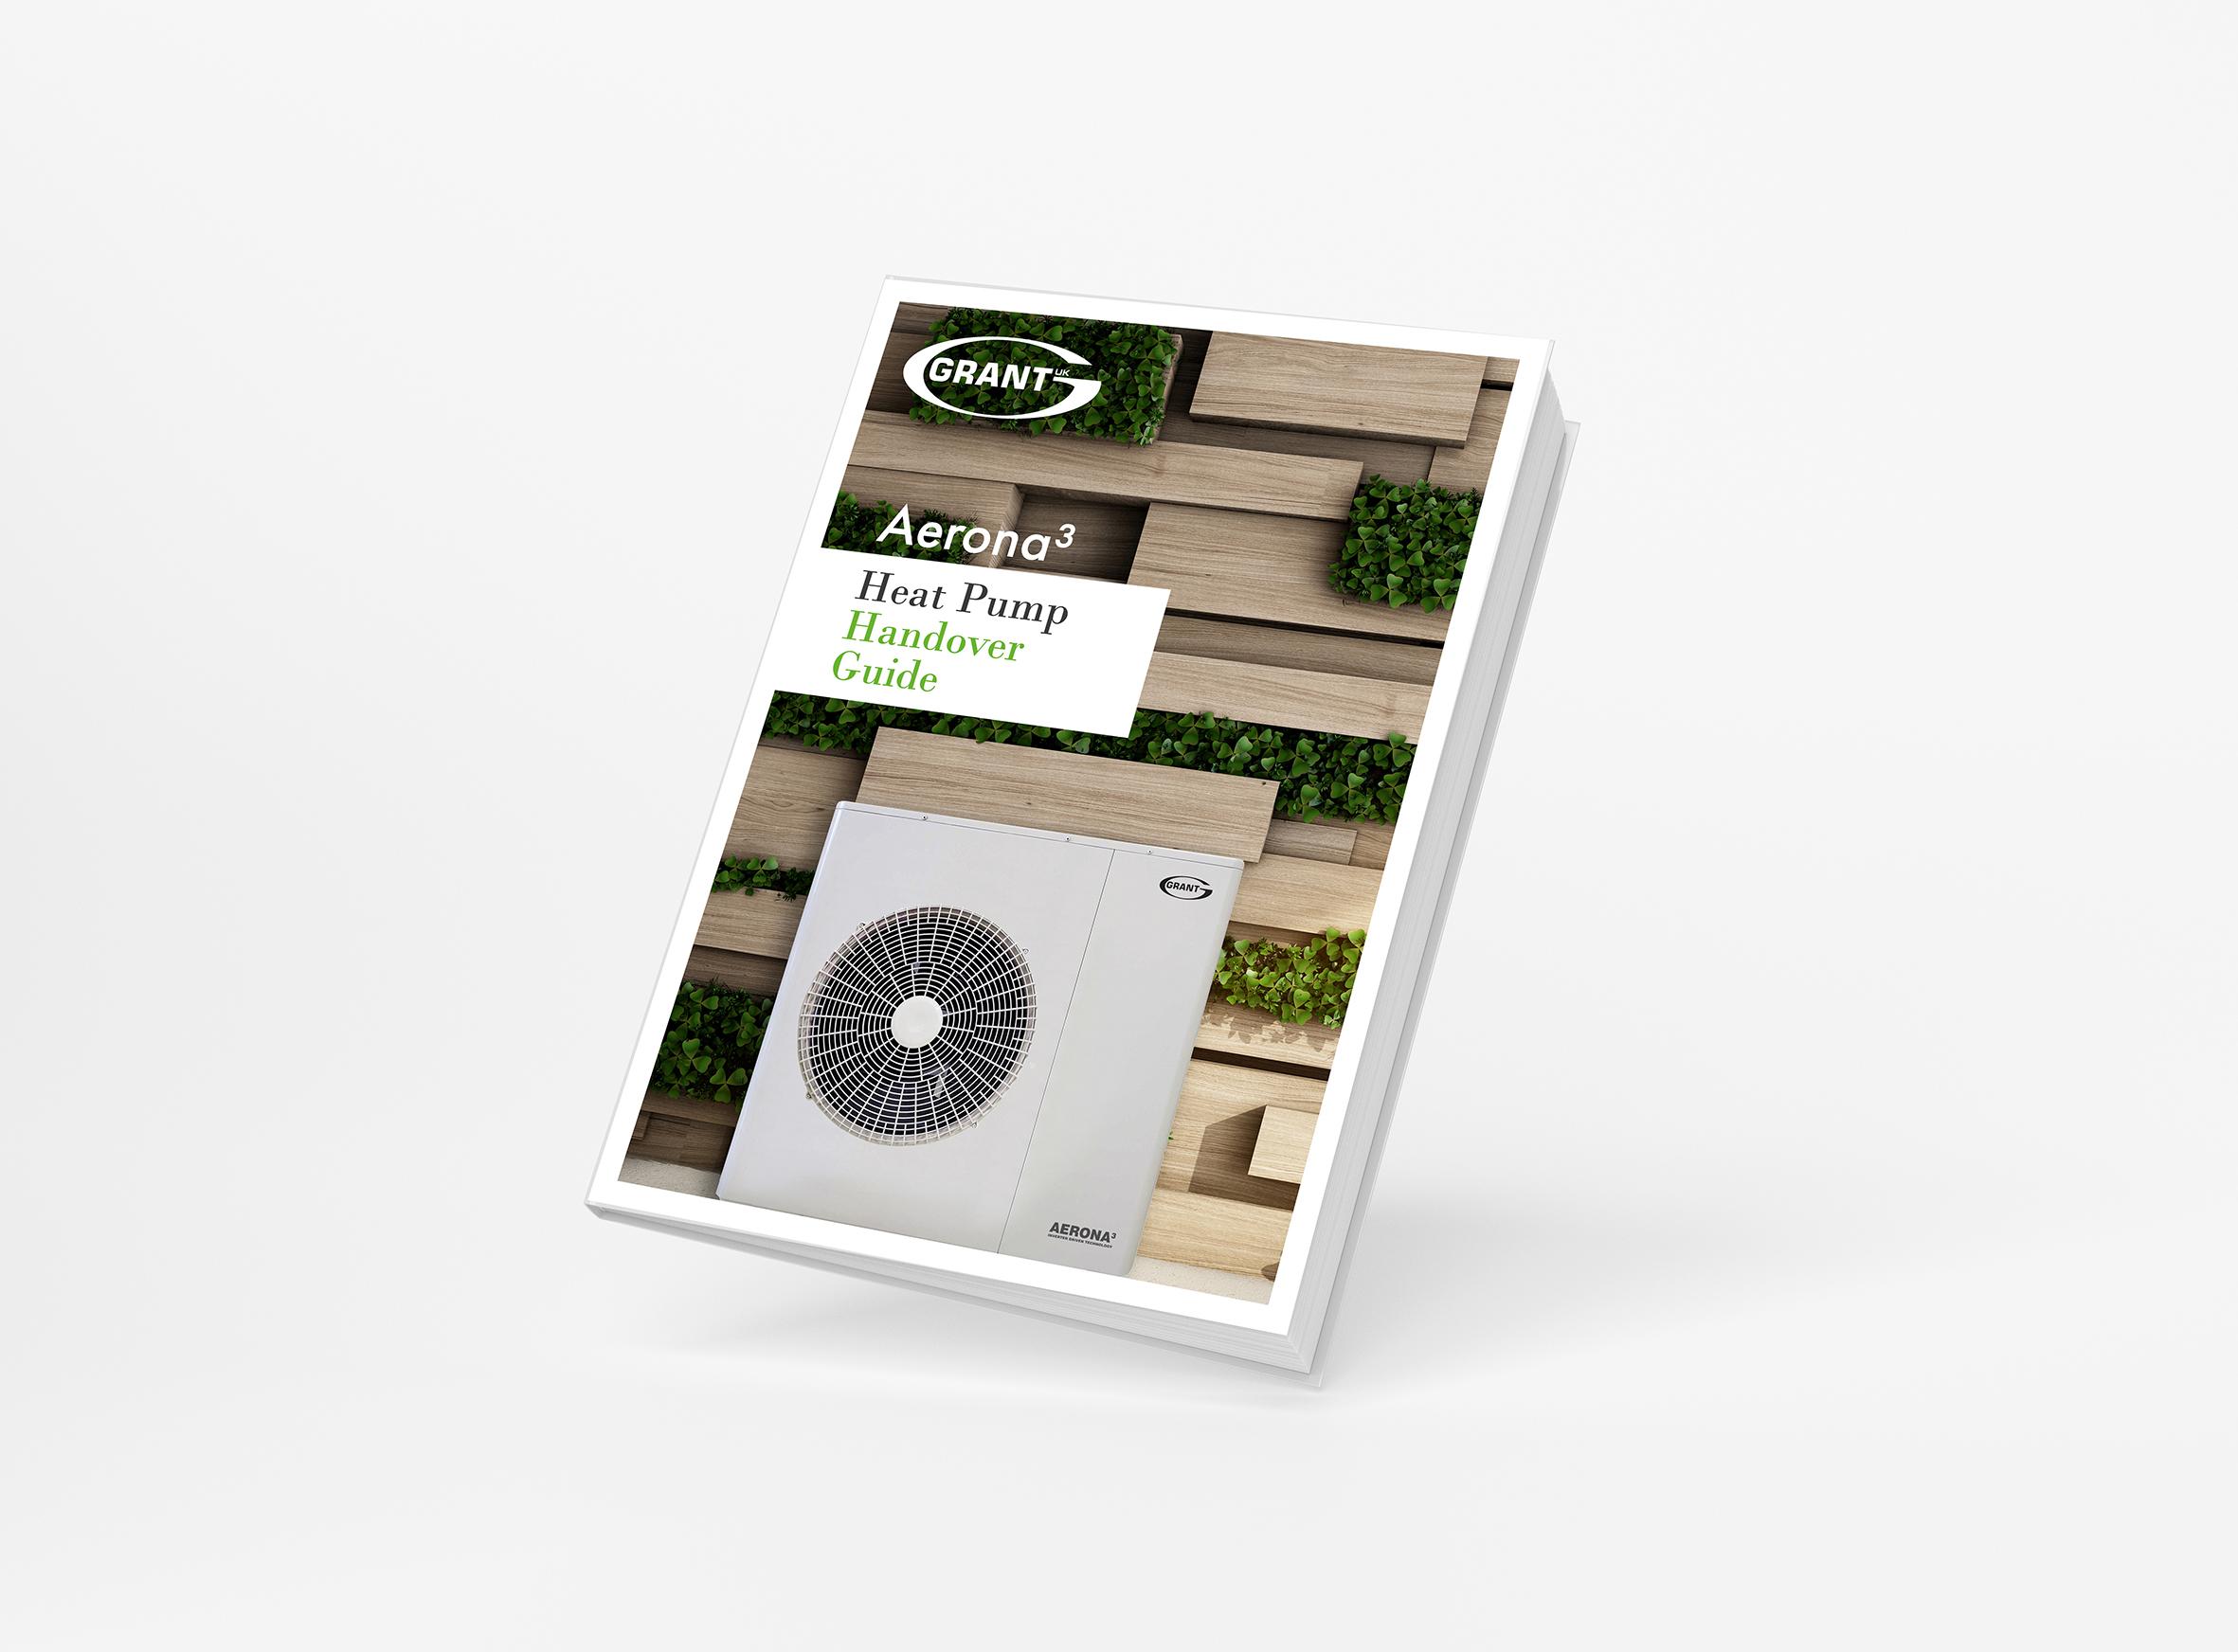 Grant UK release new Aerona³ Heat Pump Handover Guide for homeowners